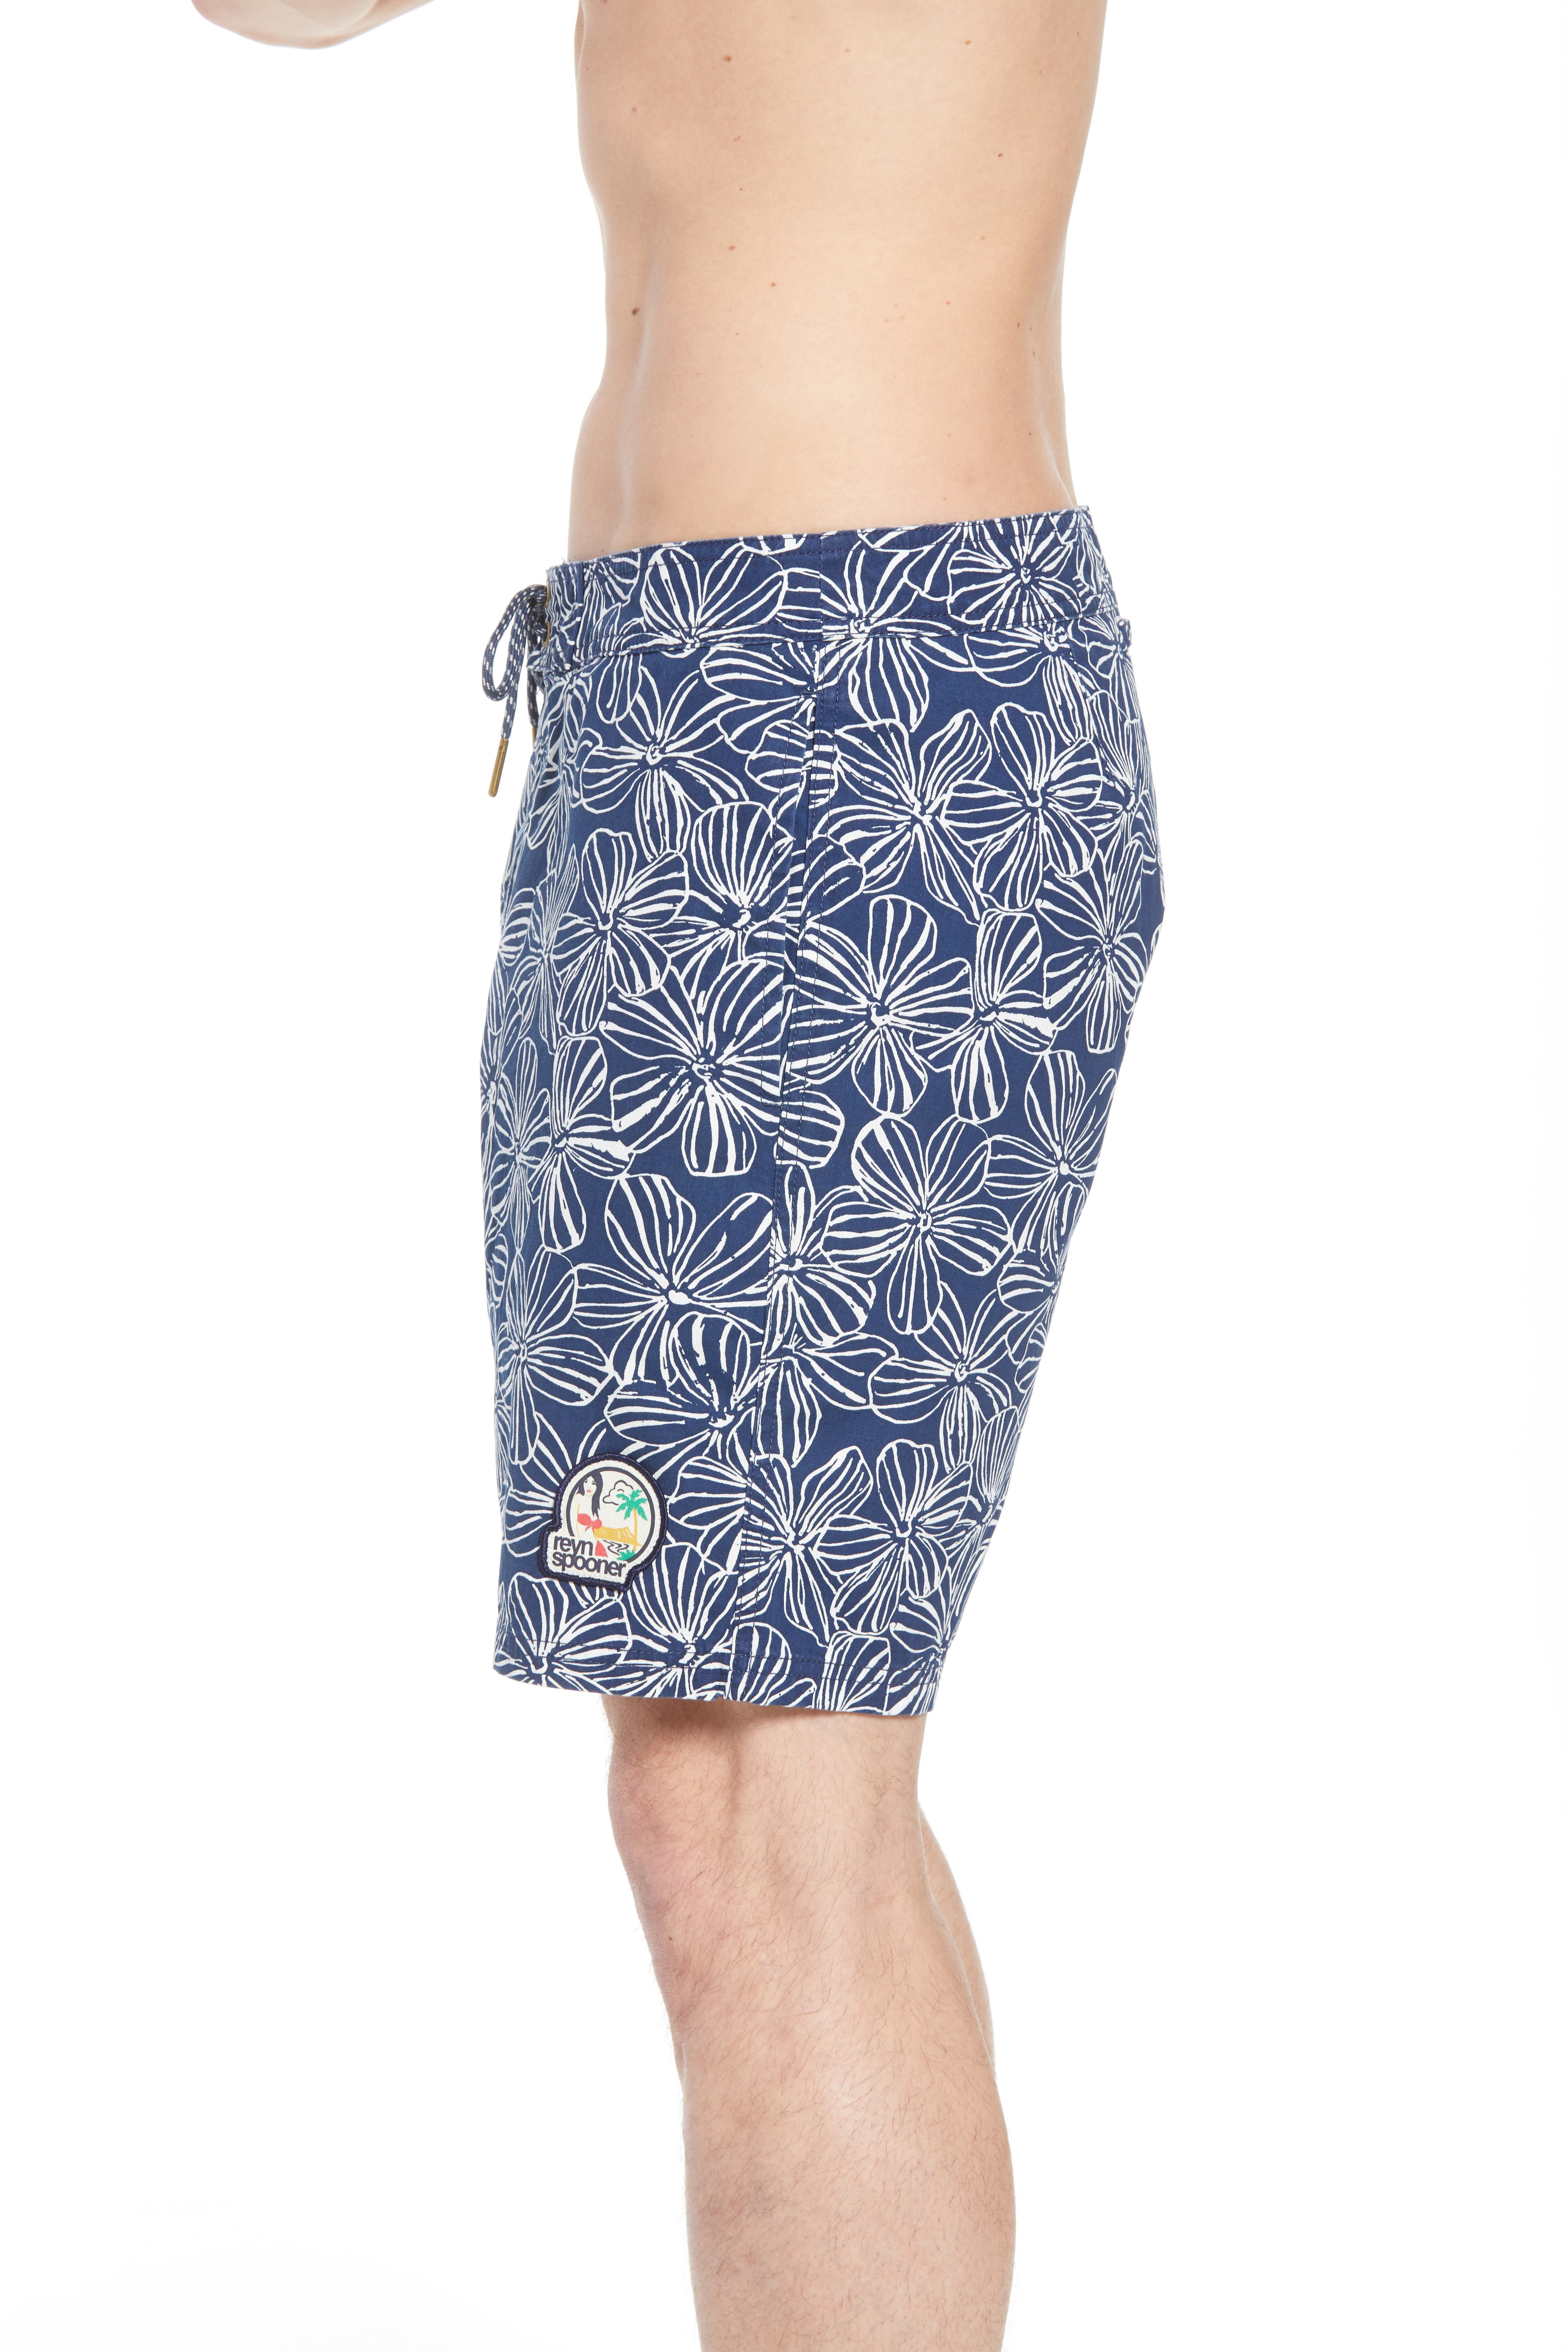 Mala Melia Regular Fit Board Shorts,                             Alternate thumbnail 3, color,                             BLUE